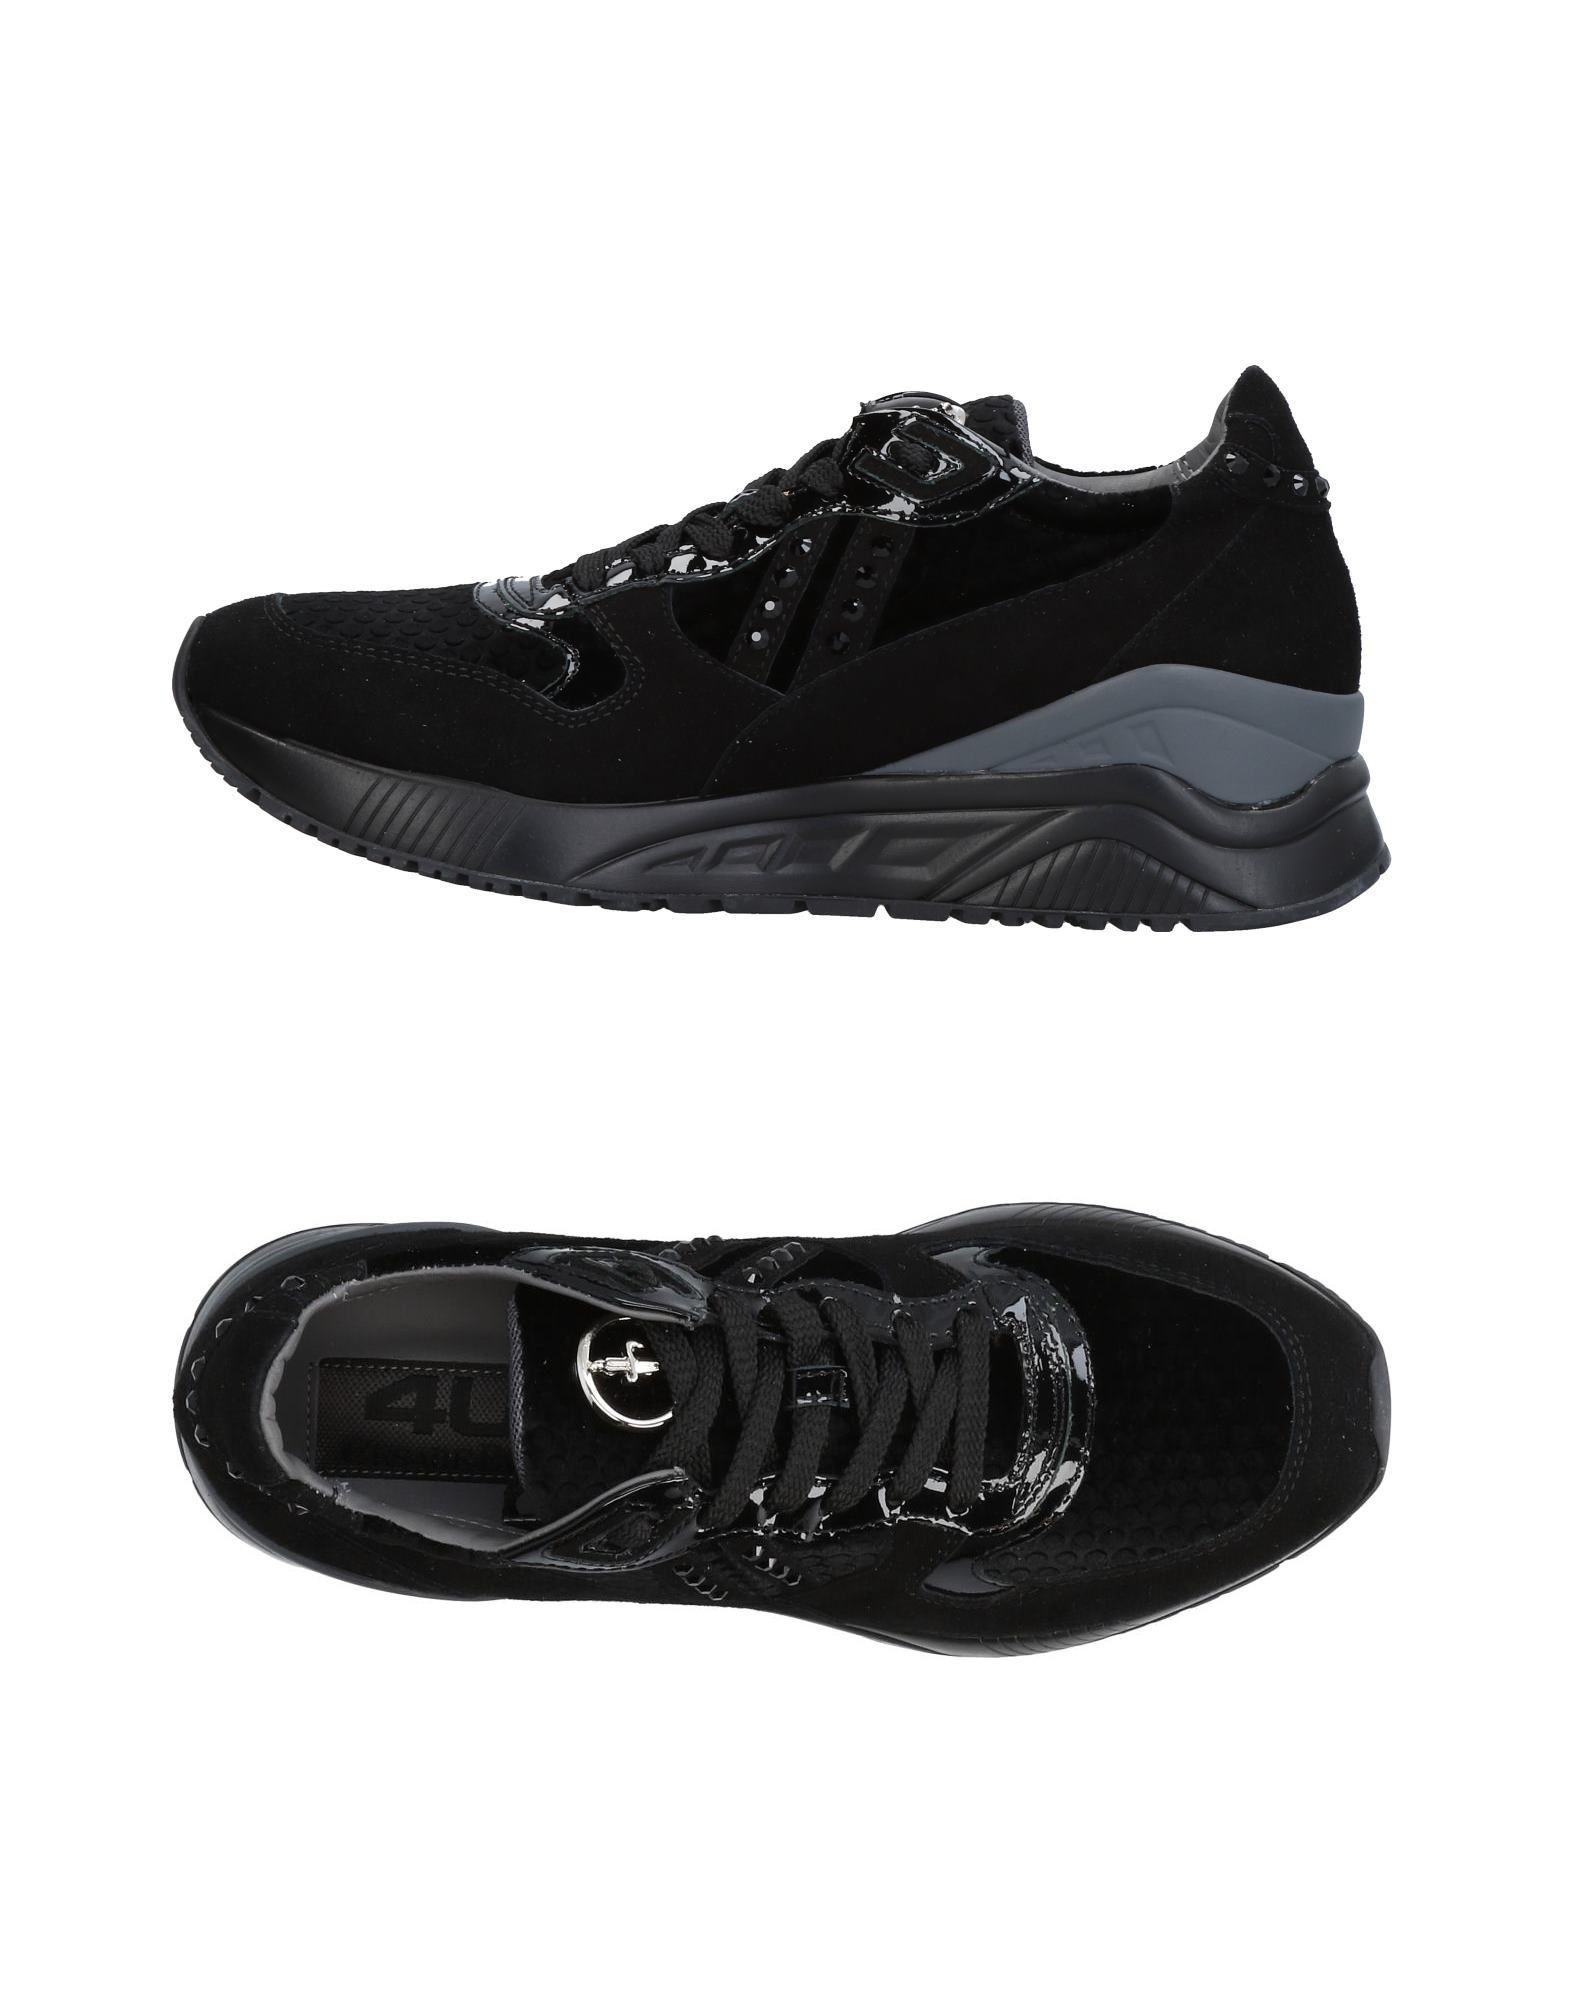 cheap for discount e9757 09af3 CESARE PACIOTTI 4US . #cesarepaciotti4us #shoes # | Cesare ...